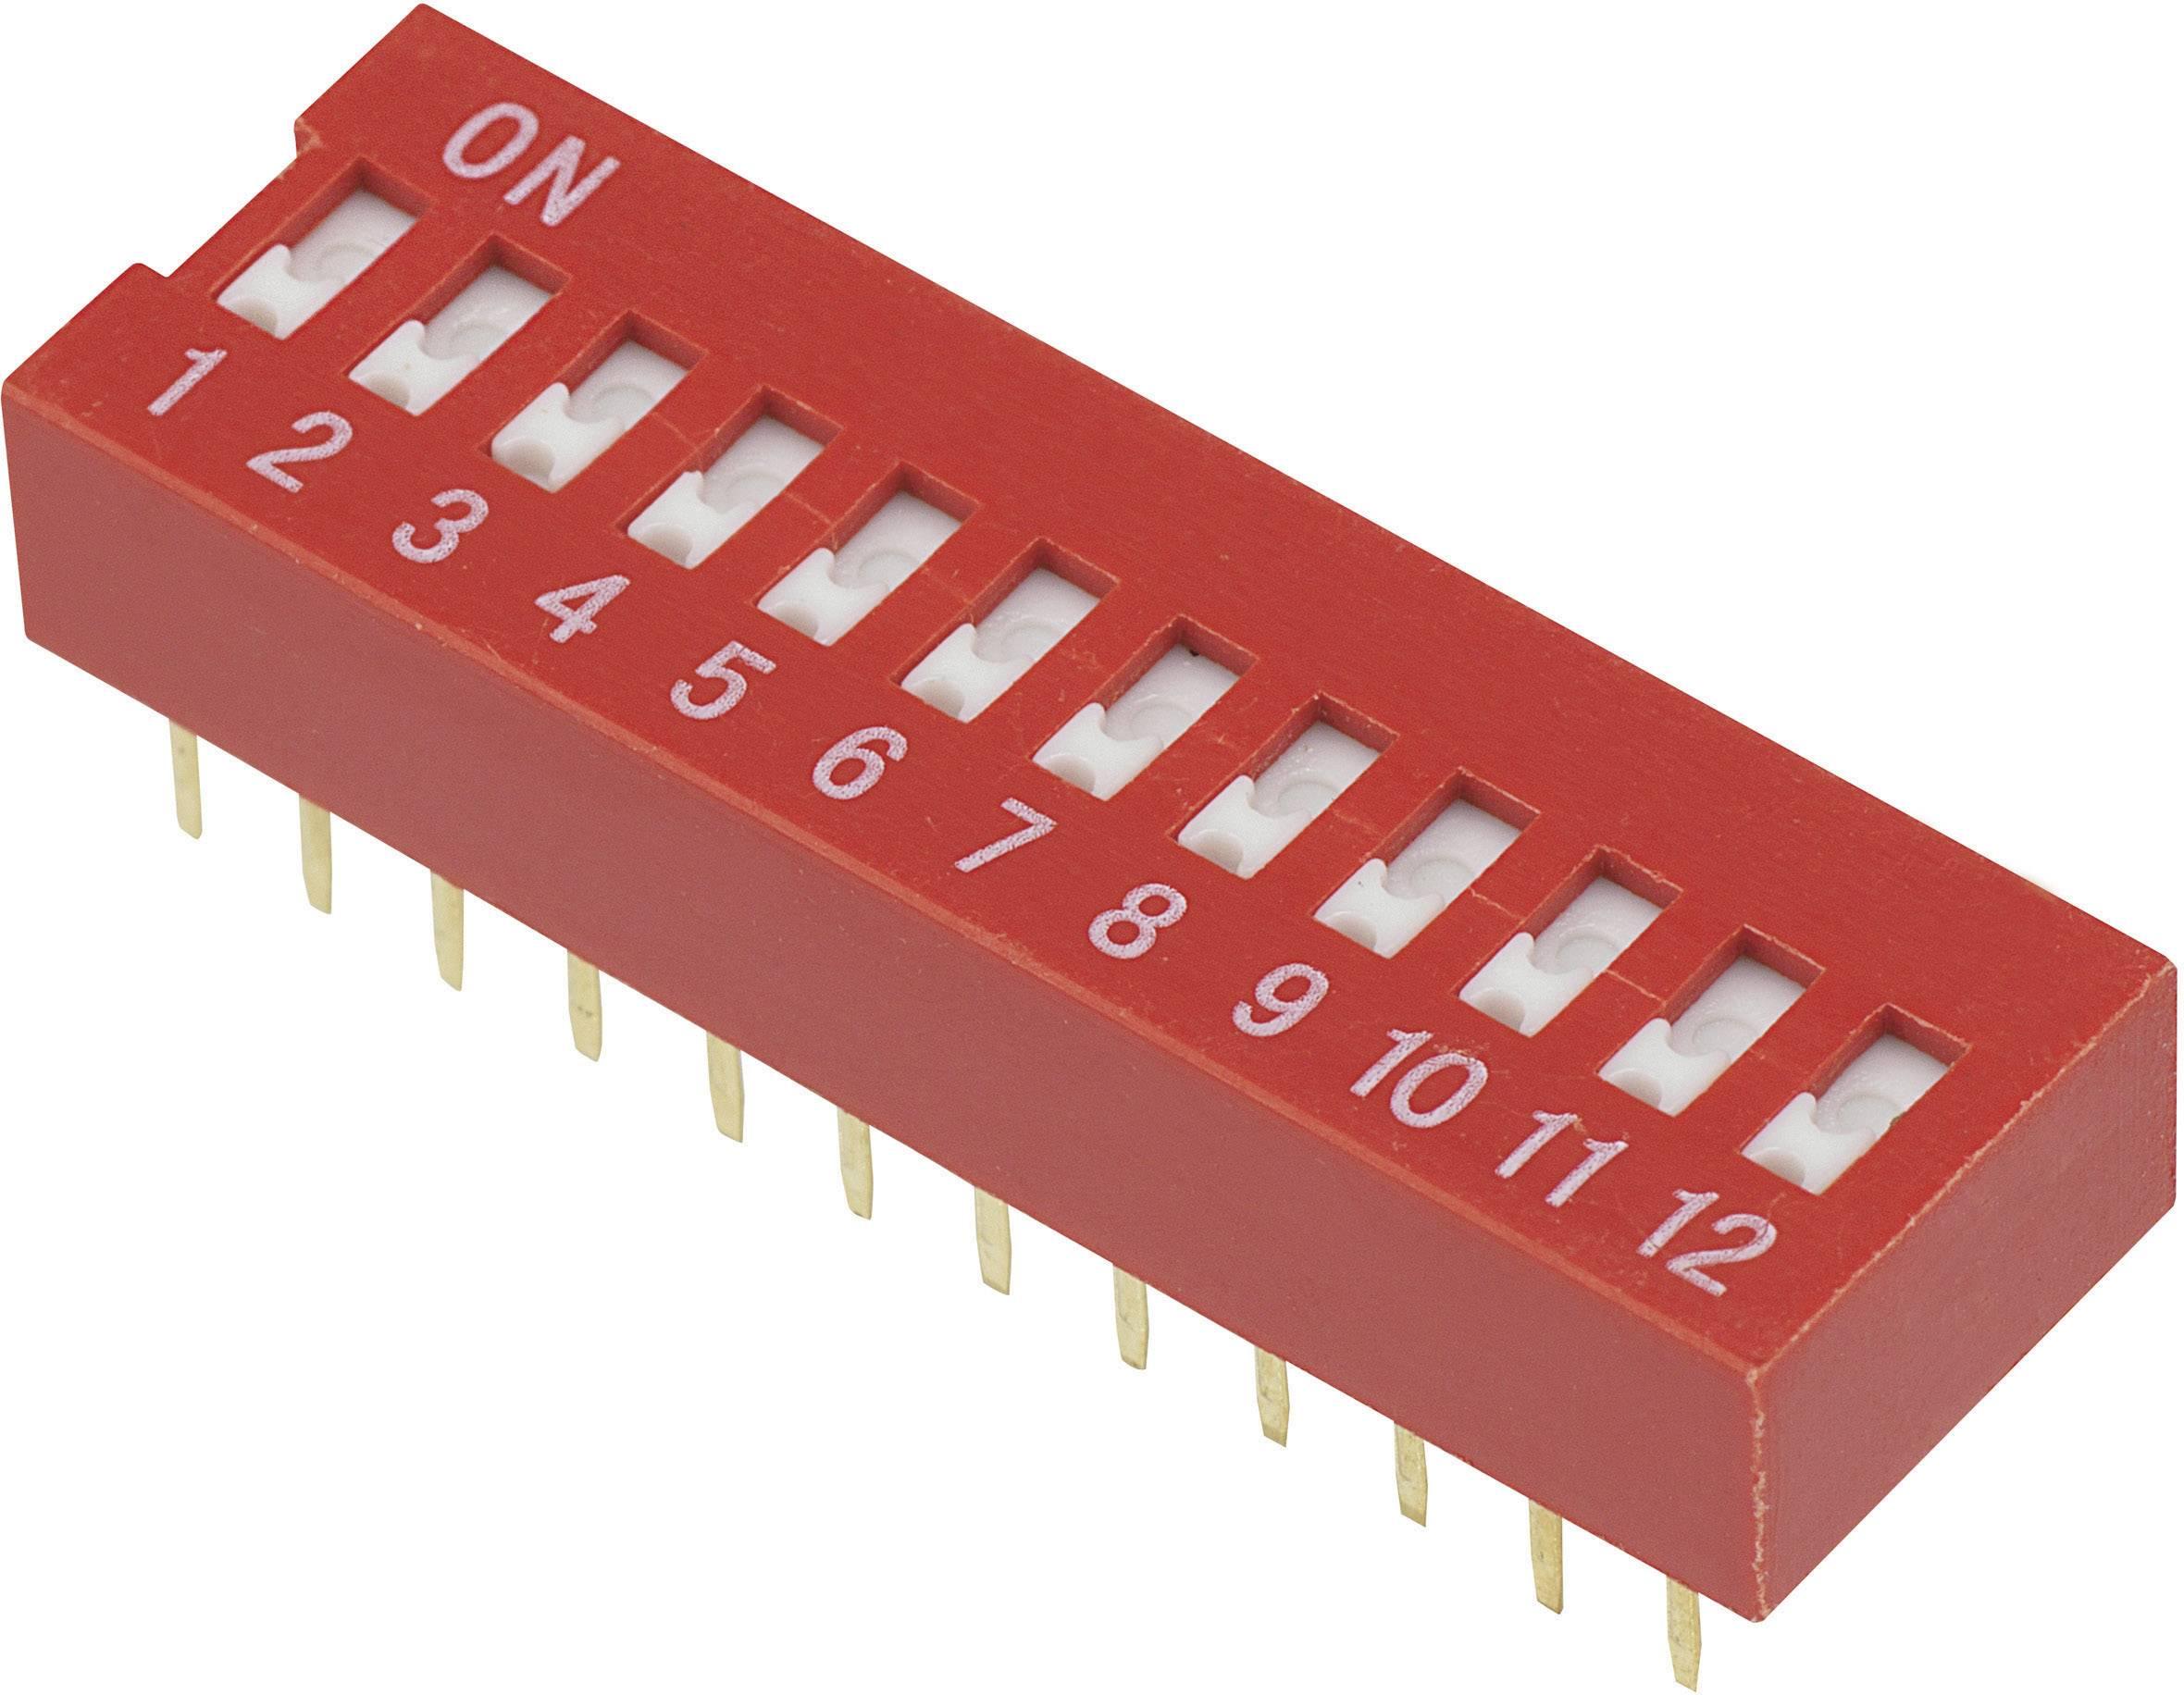 DIP spínač DSR-12, (š x v) 9,9 mm x 5,7 mm